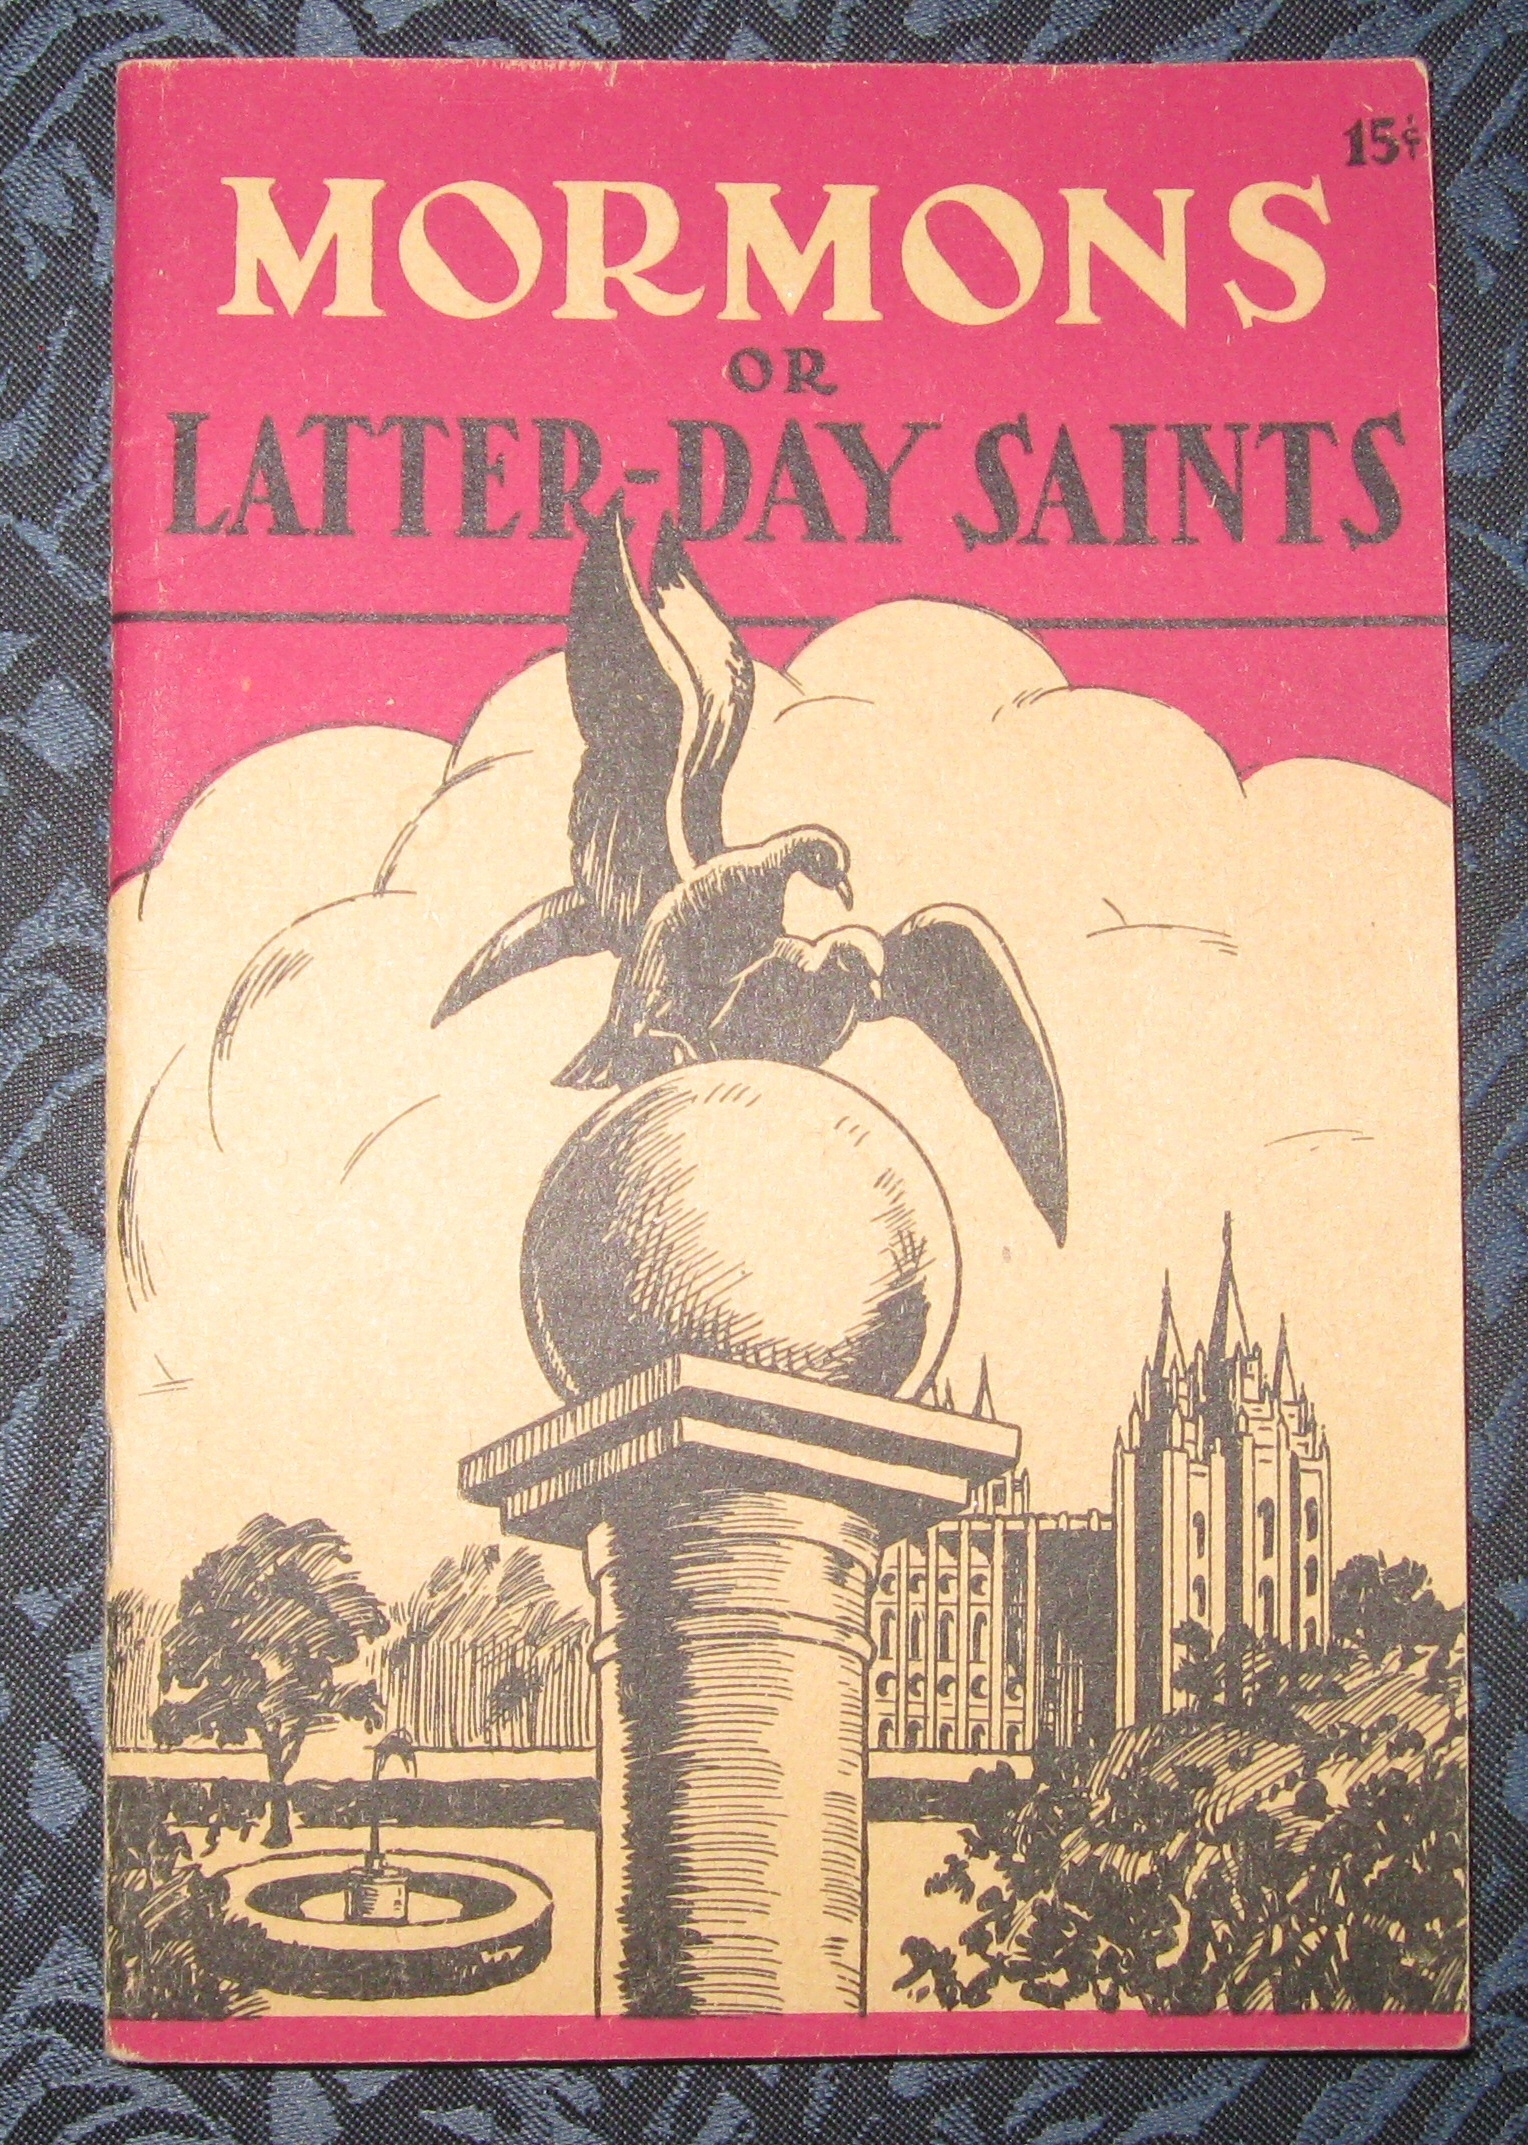 THE MORMONS OR LATTER-DAY SAINTS, Rumble, Rev. Dr. L.